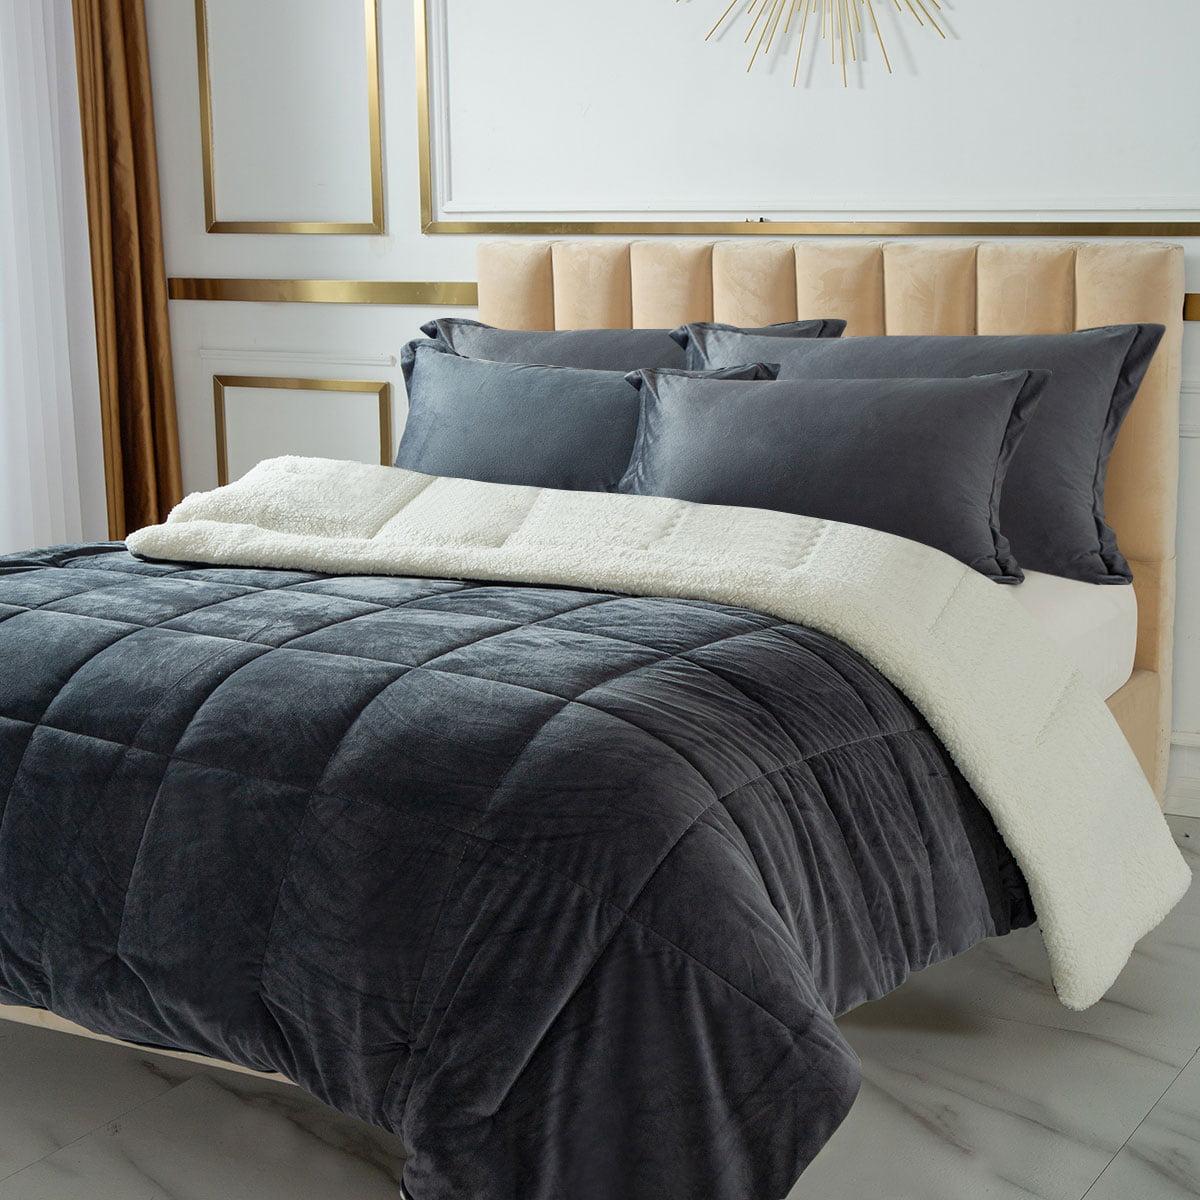 Light Weight Warm Cozy Fluf Chezmoi Collection 3-Piece Velvet Sherpa Quilt Set